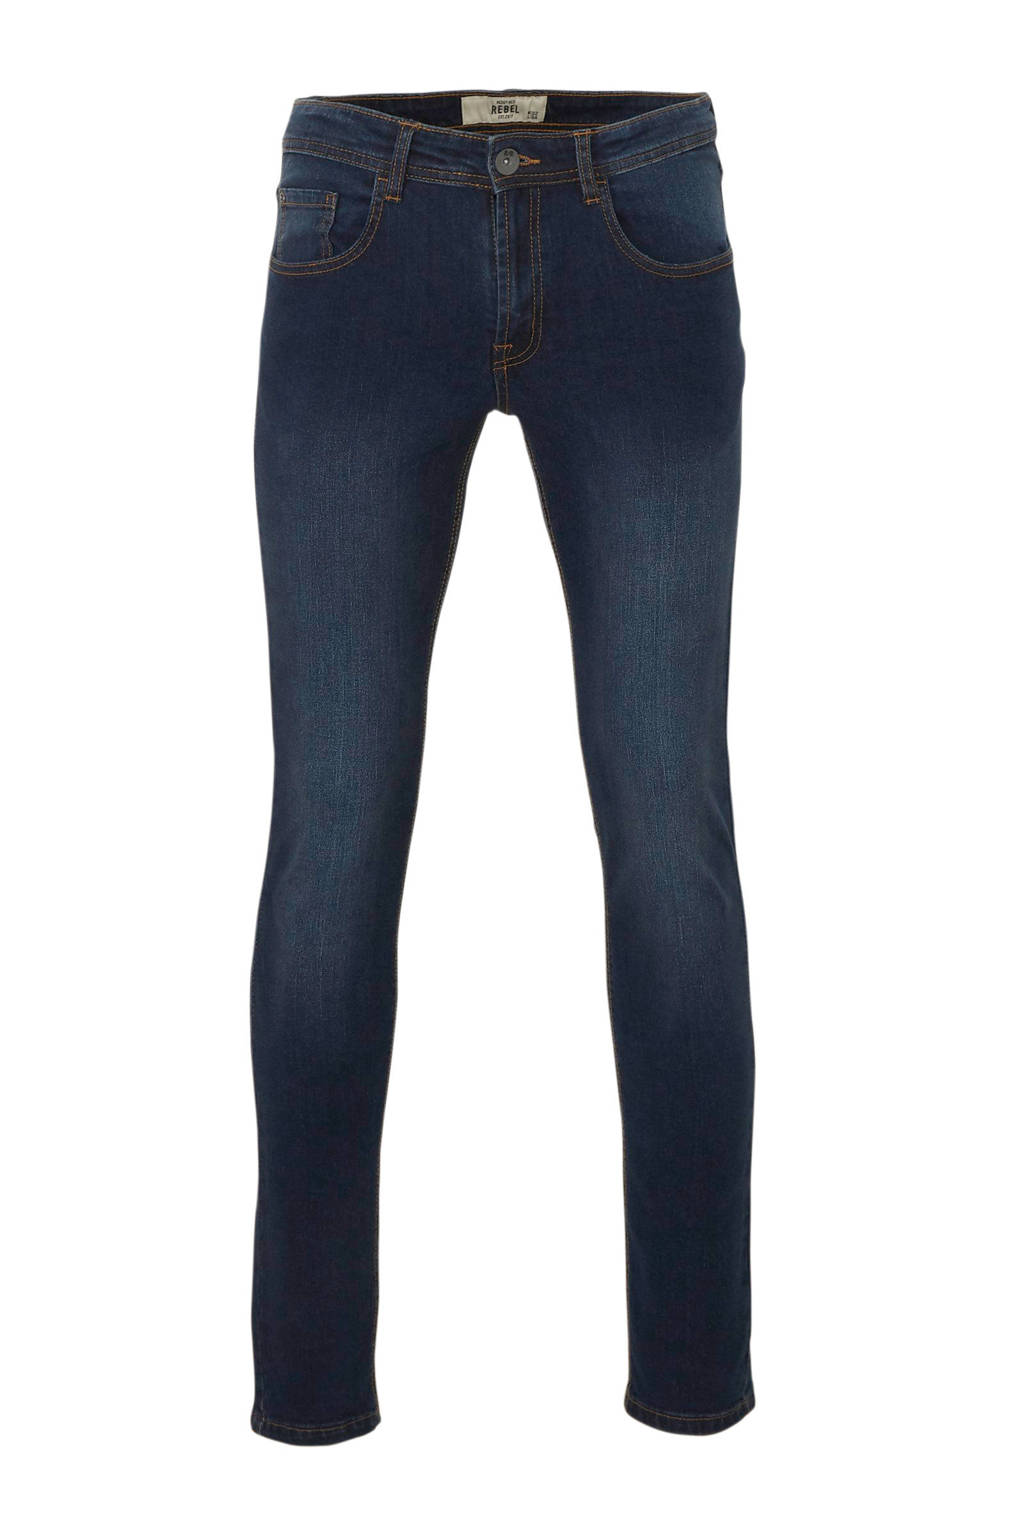 Redefined Rebel skinny jeans RR Copenhagen, Dark Sea